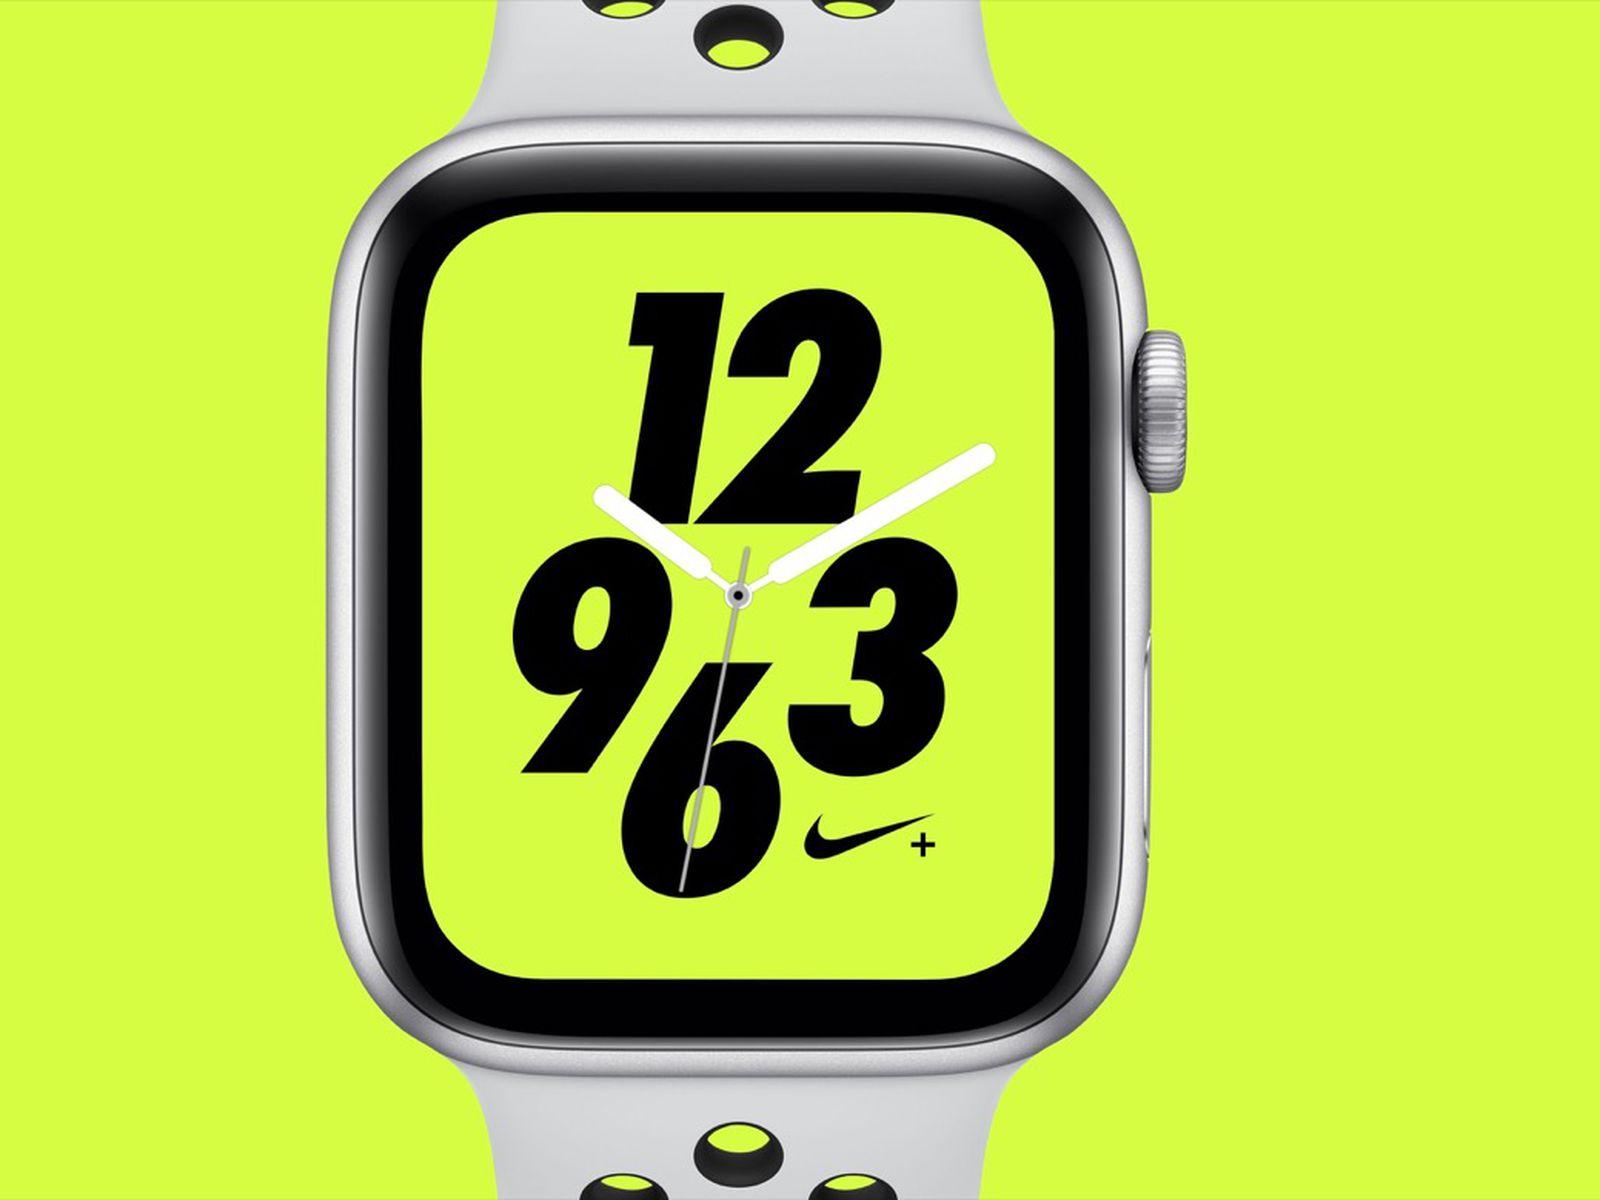 La ciudad Puntualidad podar  Apple Watch Series 4 Nike+ Models Have Slightly Later October 5 Launch Date  - MacRumors